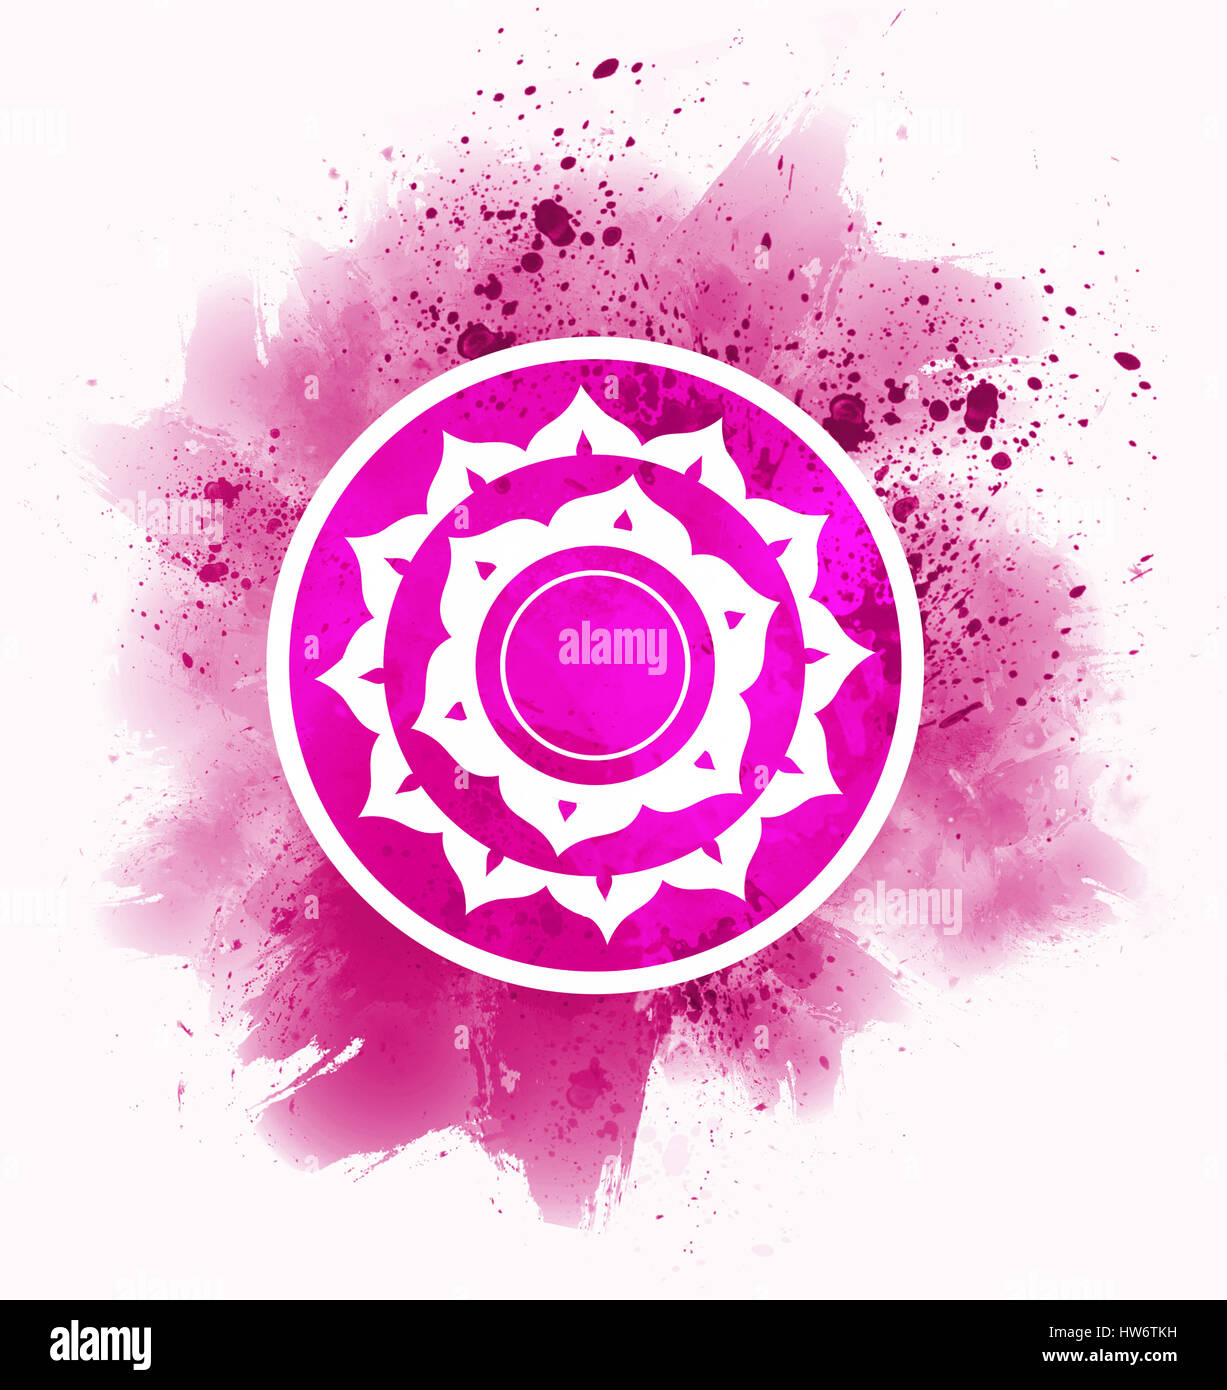 Sahasrara chakra symbol stock photo 135990053 alamy sahasrara chakra symbol buycottarizona Image collections